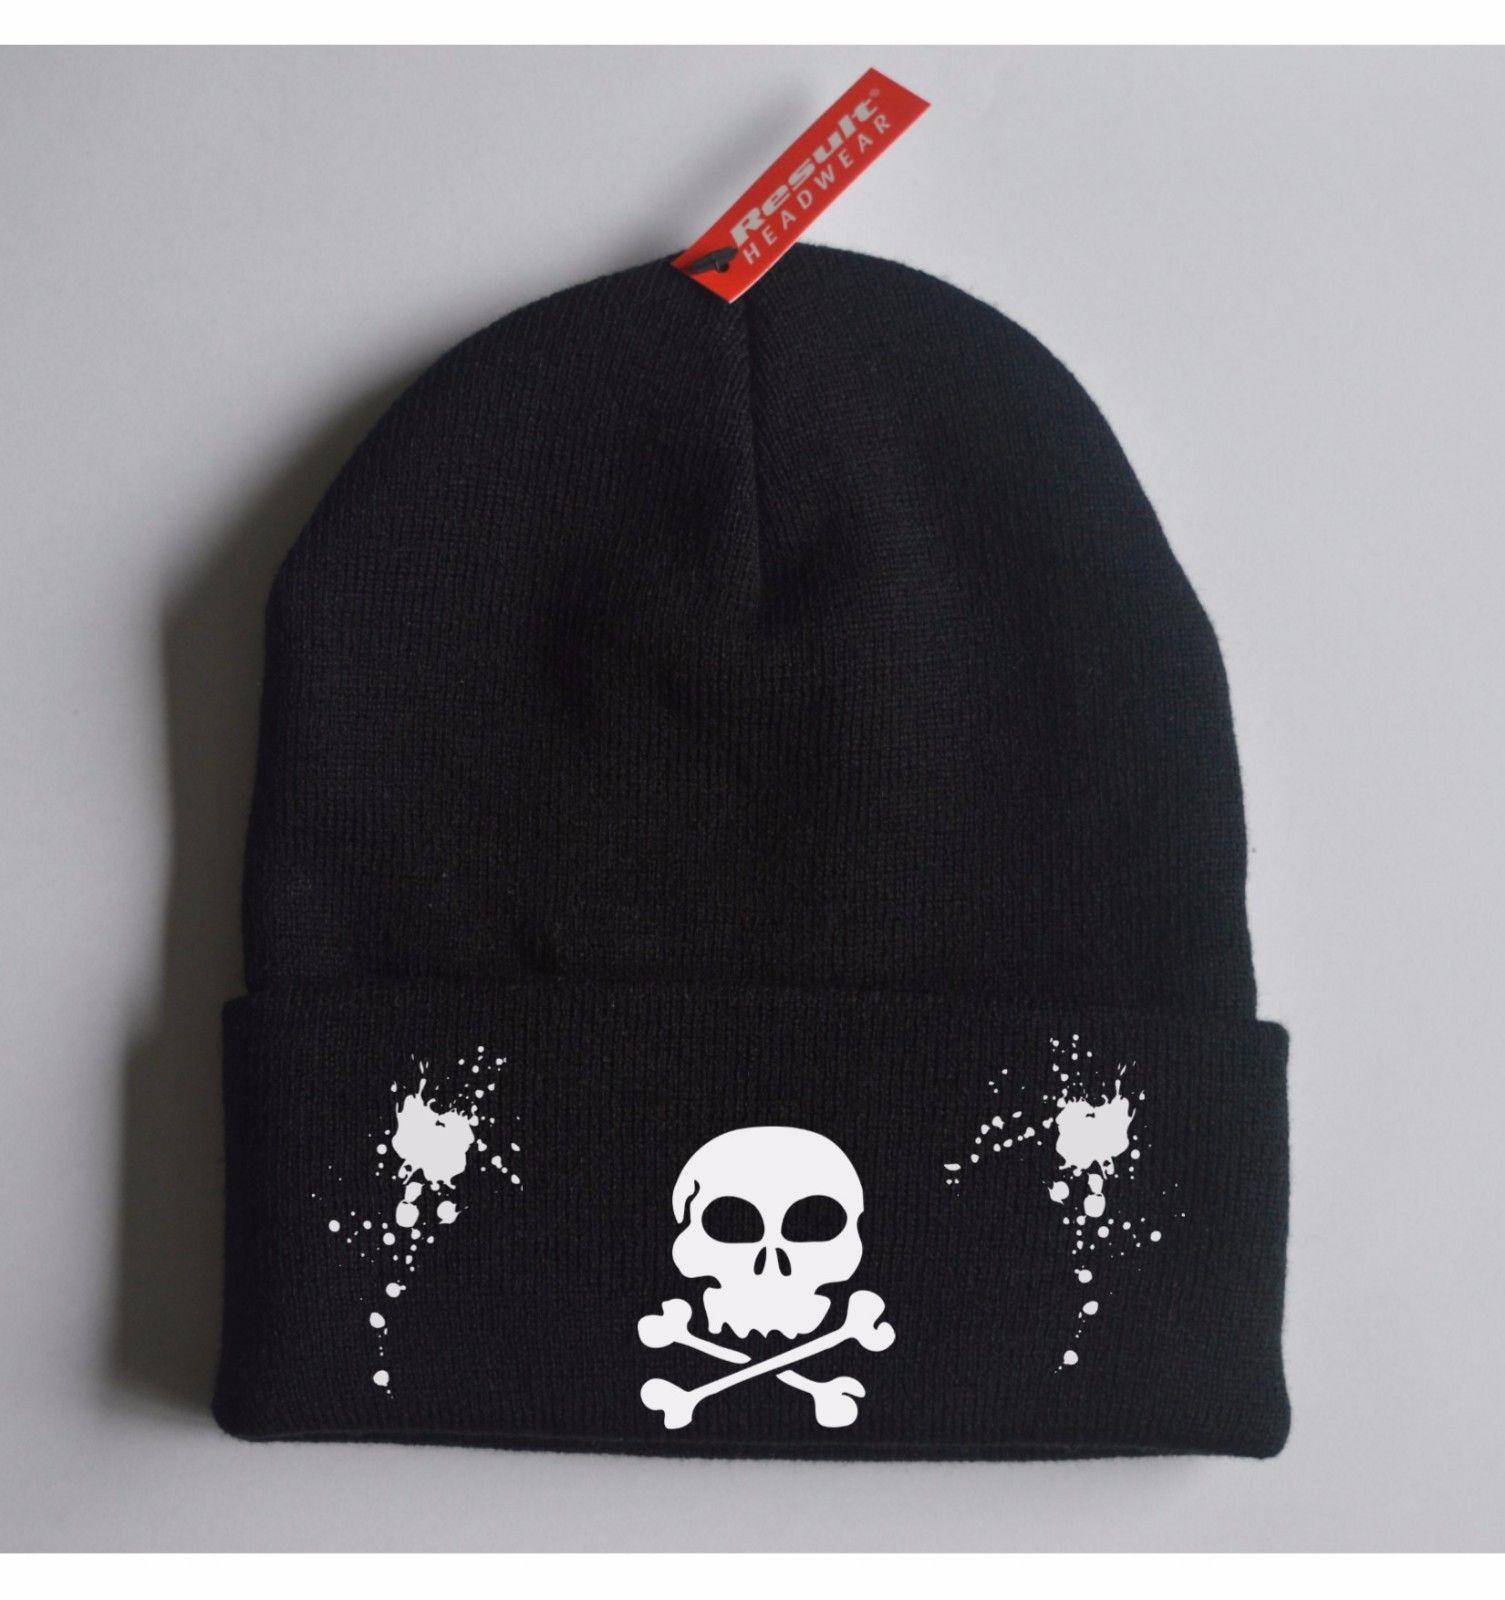 bf6450dabcbdc Printed Beanie SKULL Skate Urban Hat Graffiti Cap Knit Caps New Gift ...